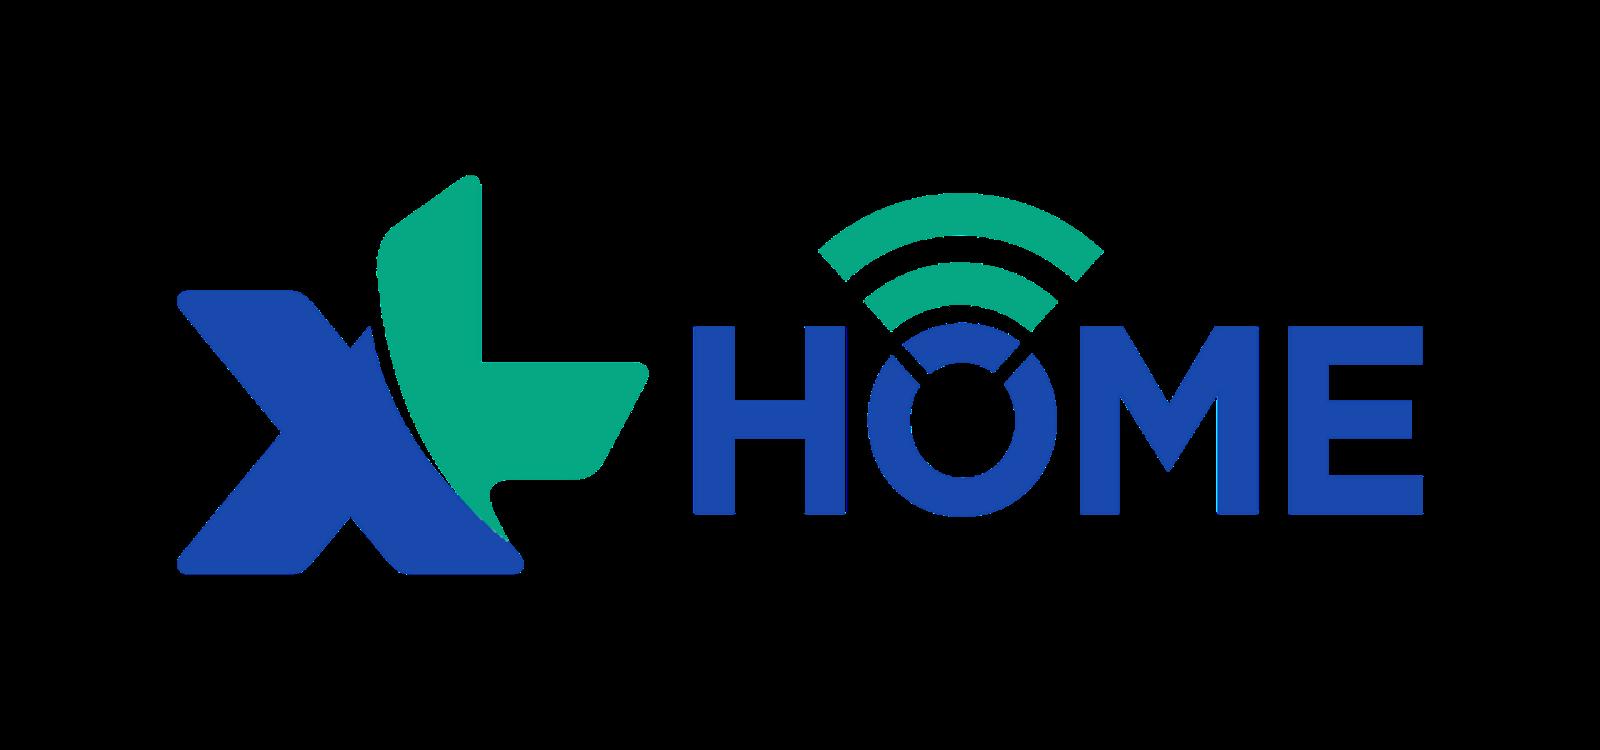 Logo XL Home Format PNG